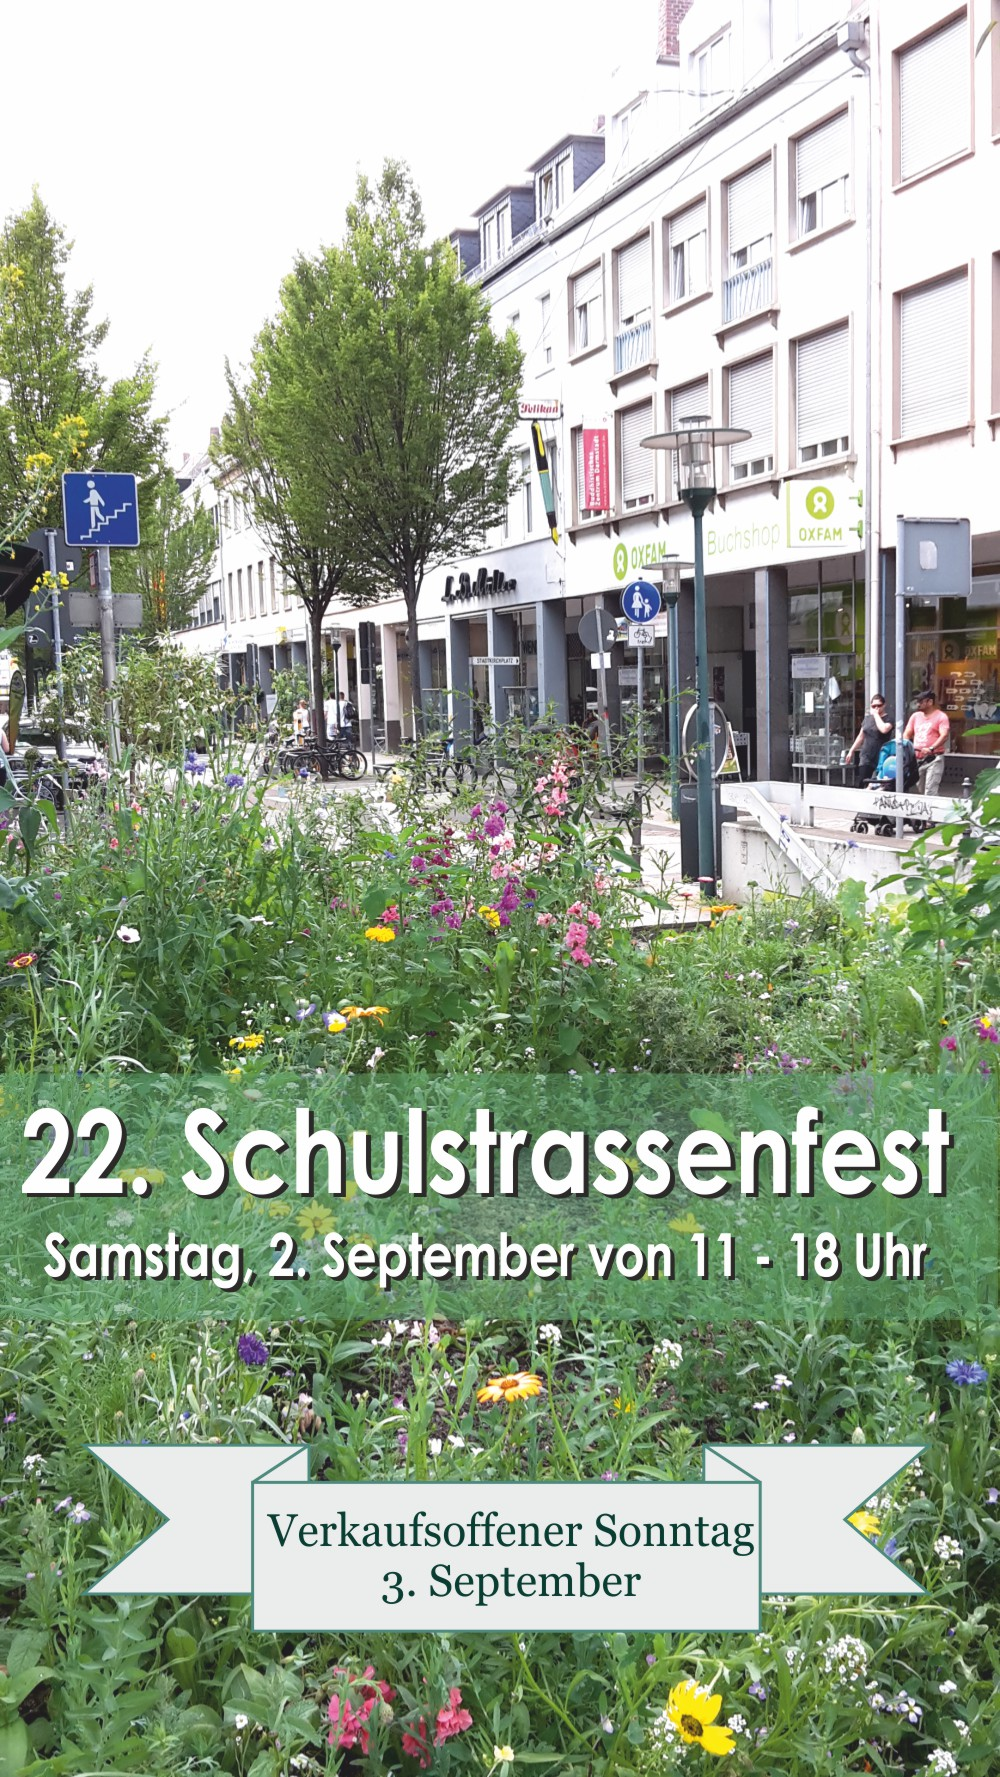 Schulstrassenfest am 2. September 2017